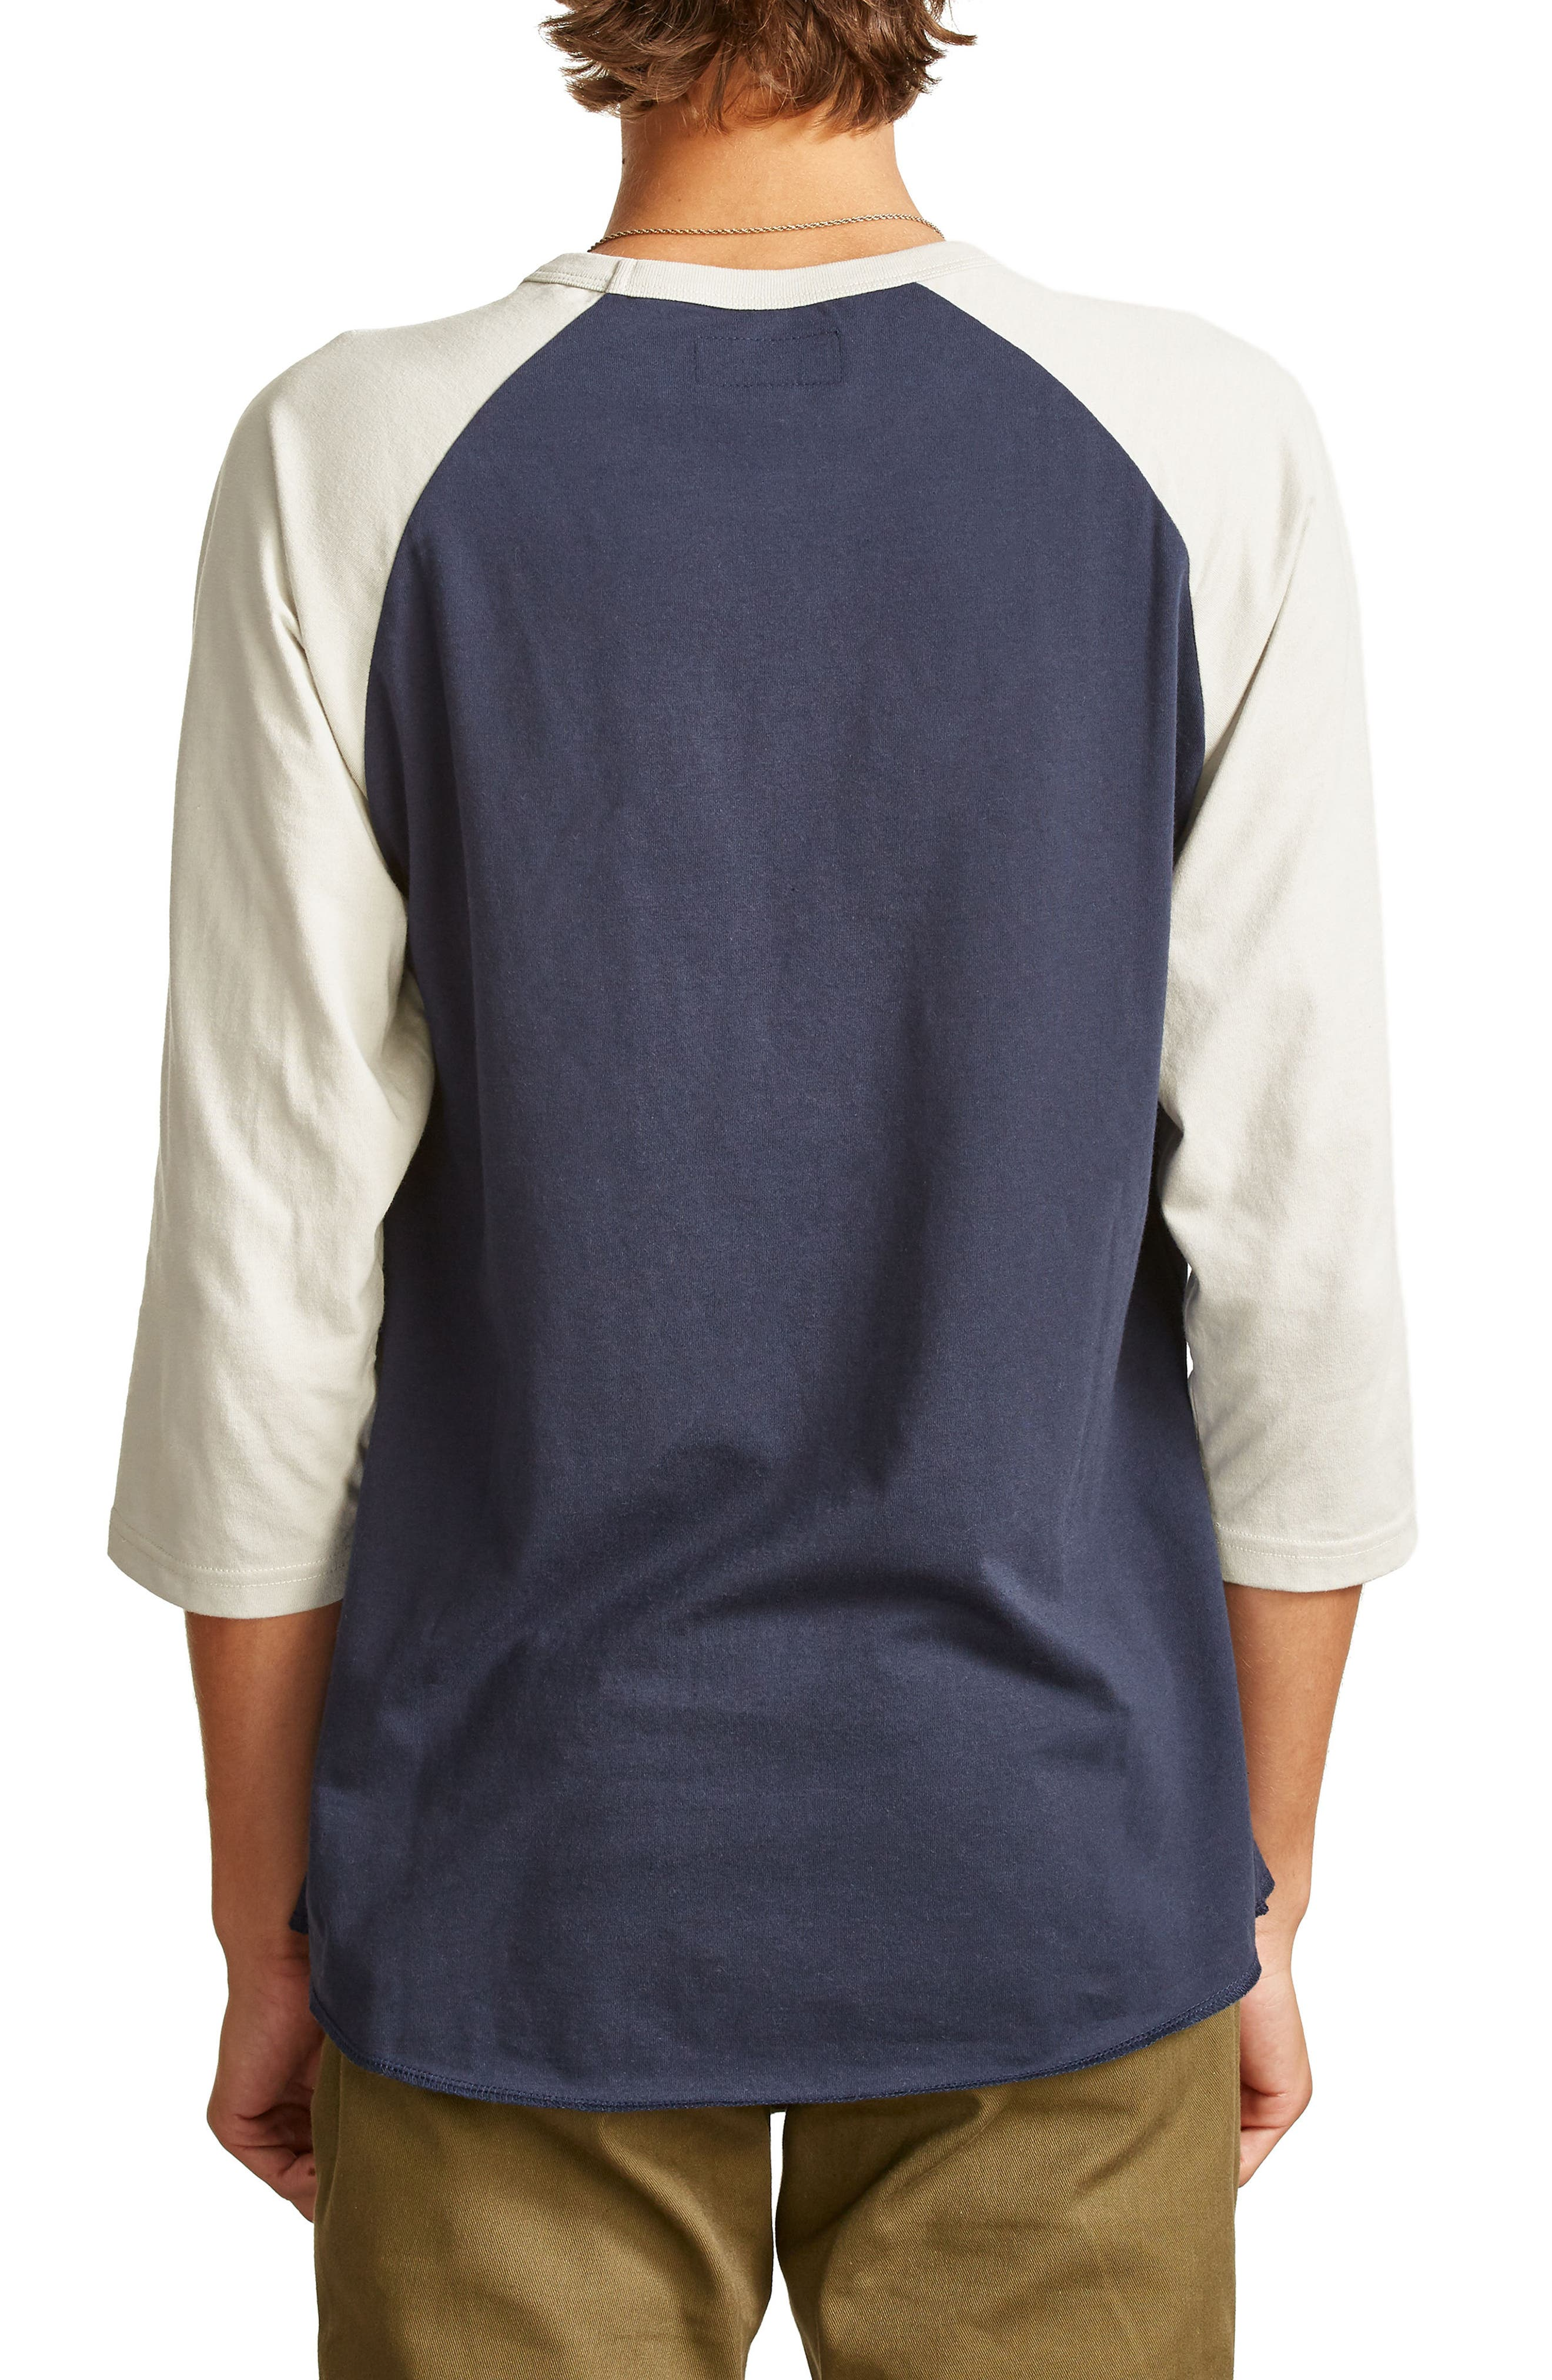 Garth Baseball T-Shirt,                             Alternate thumbnail 2, color,                             Navy